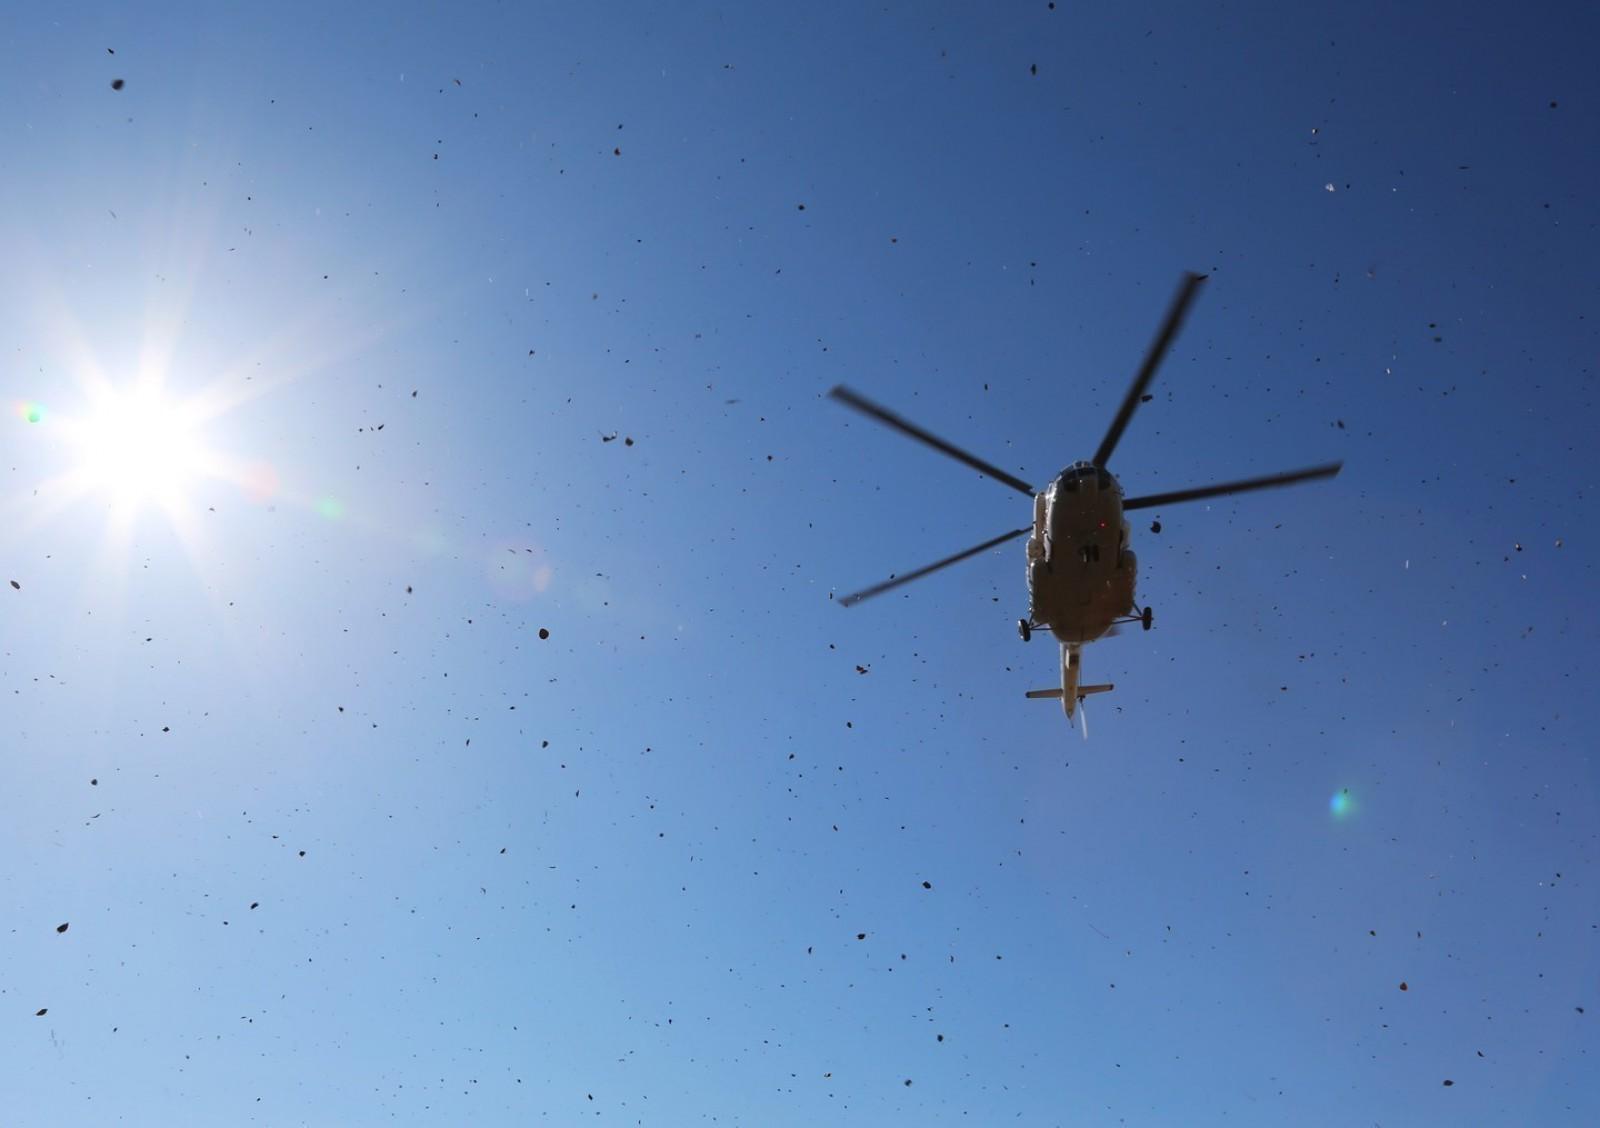 Un nou accident aviatic în Rusia: Un elicopter de tip MI-8 a luat foc